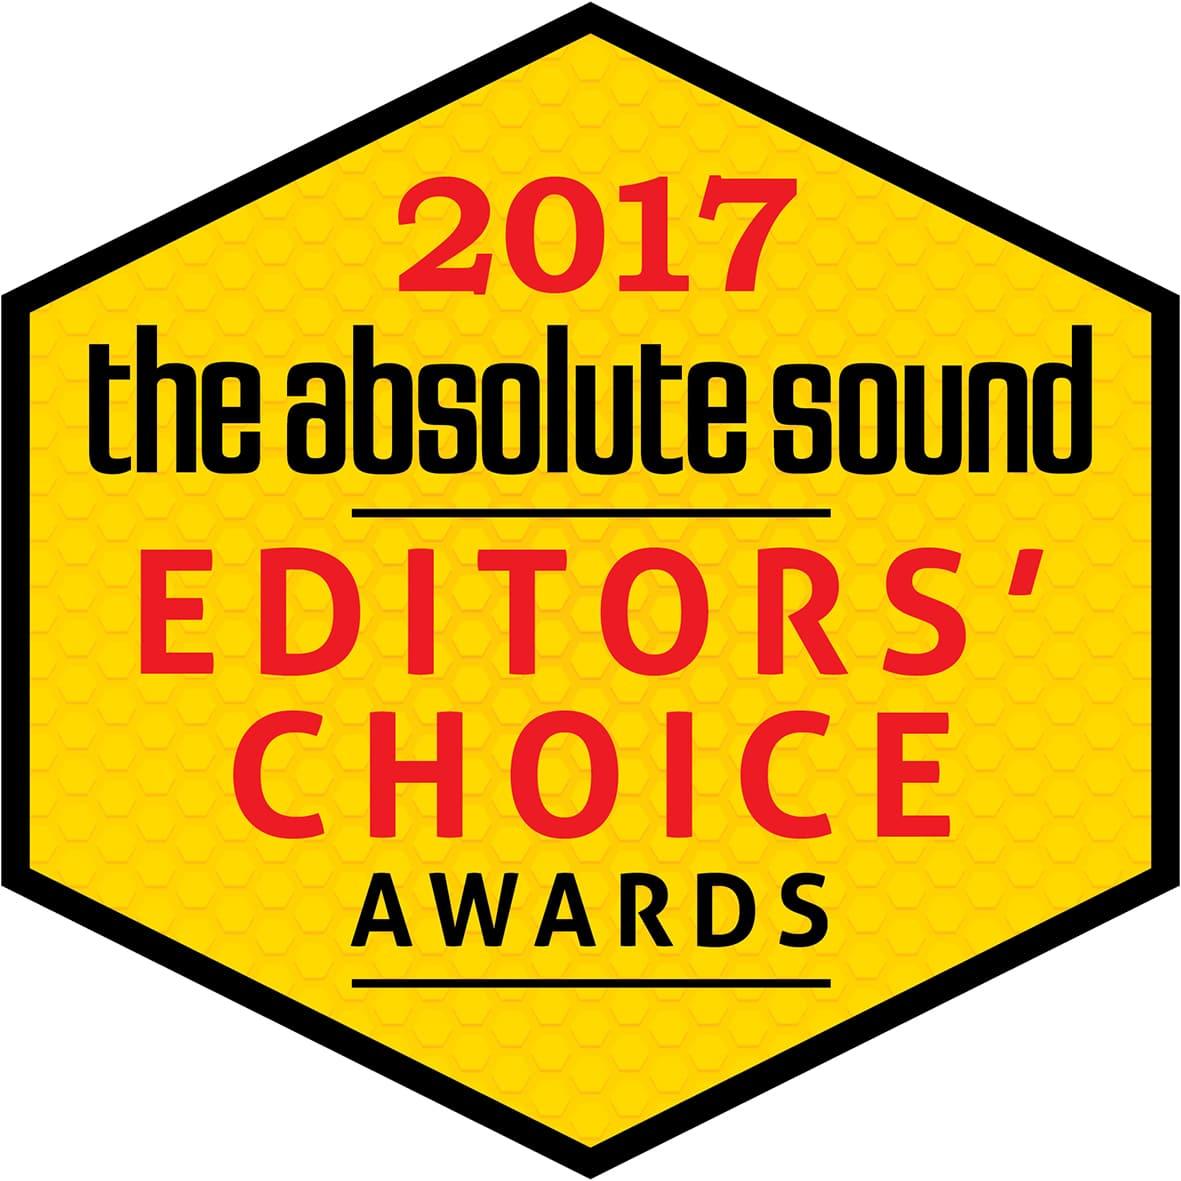 Editors choice award 2017 for S-15